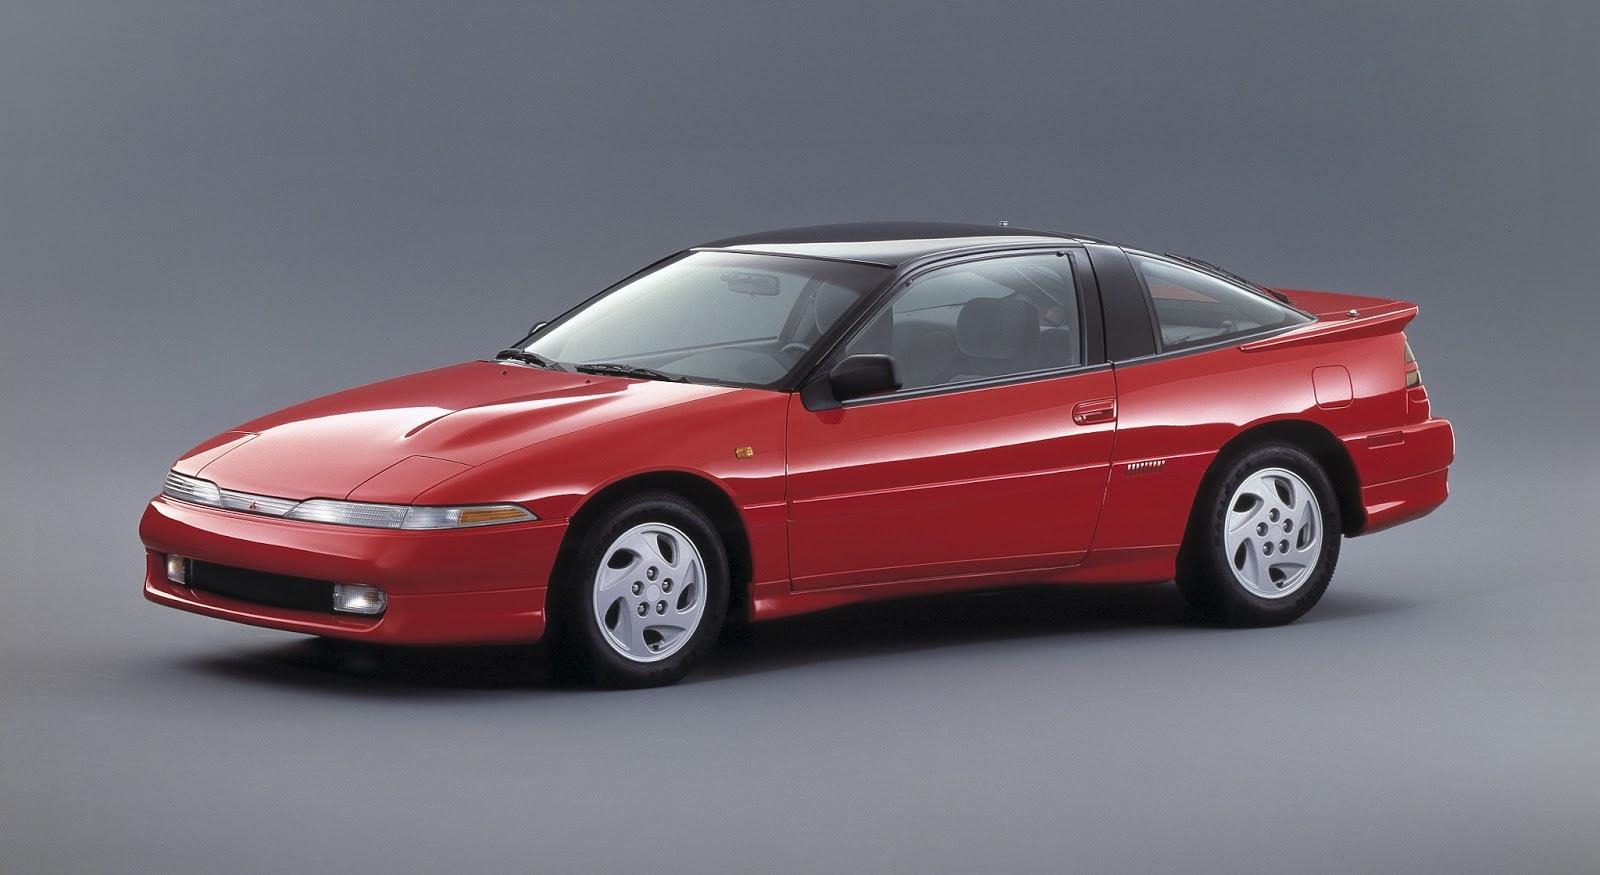 89-94 1st generation Mitsubishi Eclipse/ Eagle Talon/Plymouth Laser